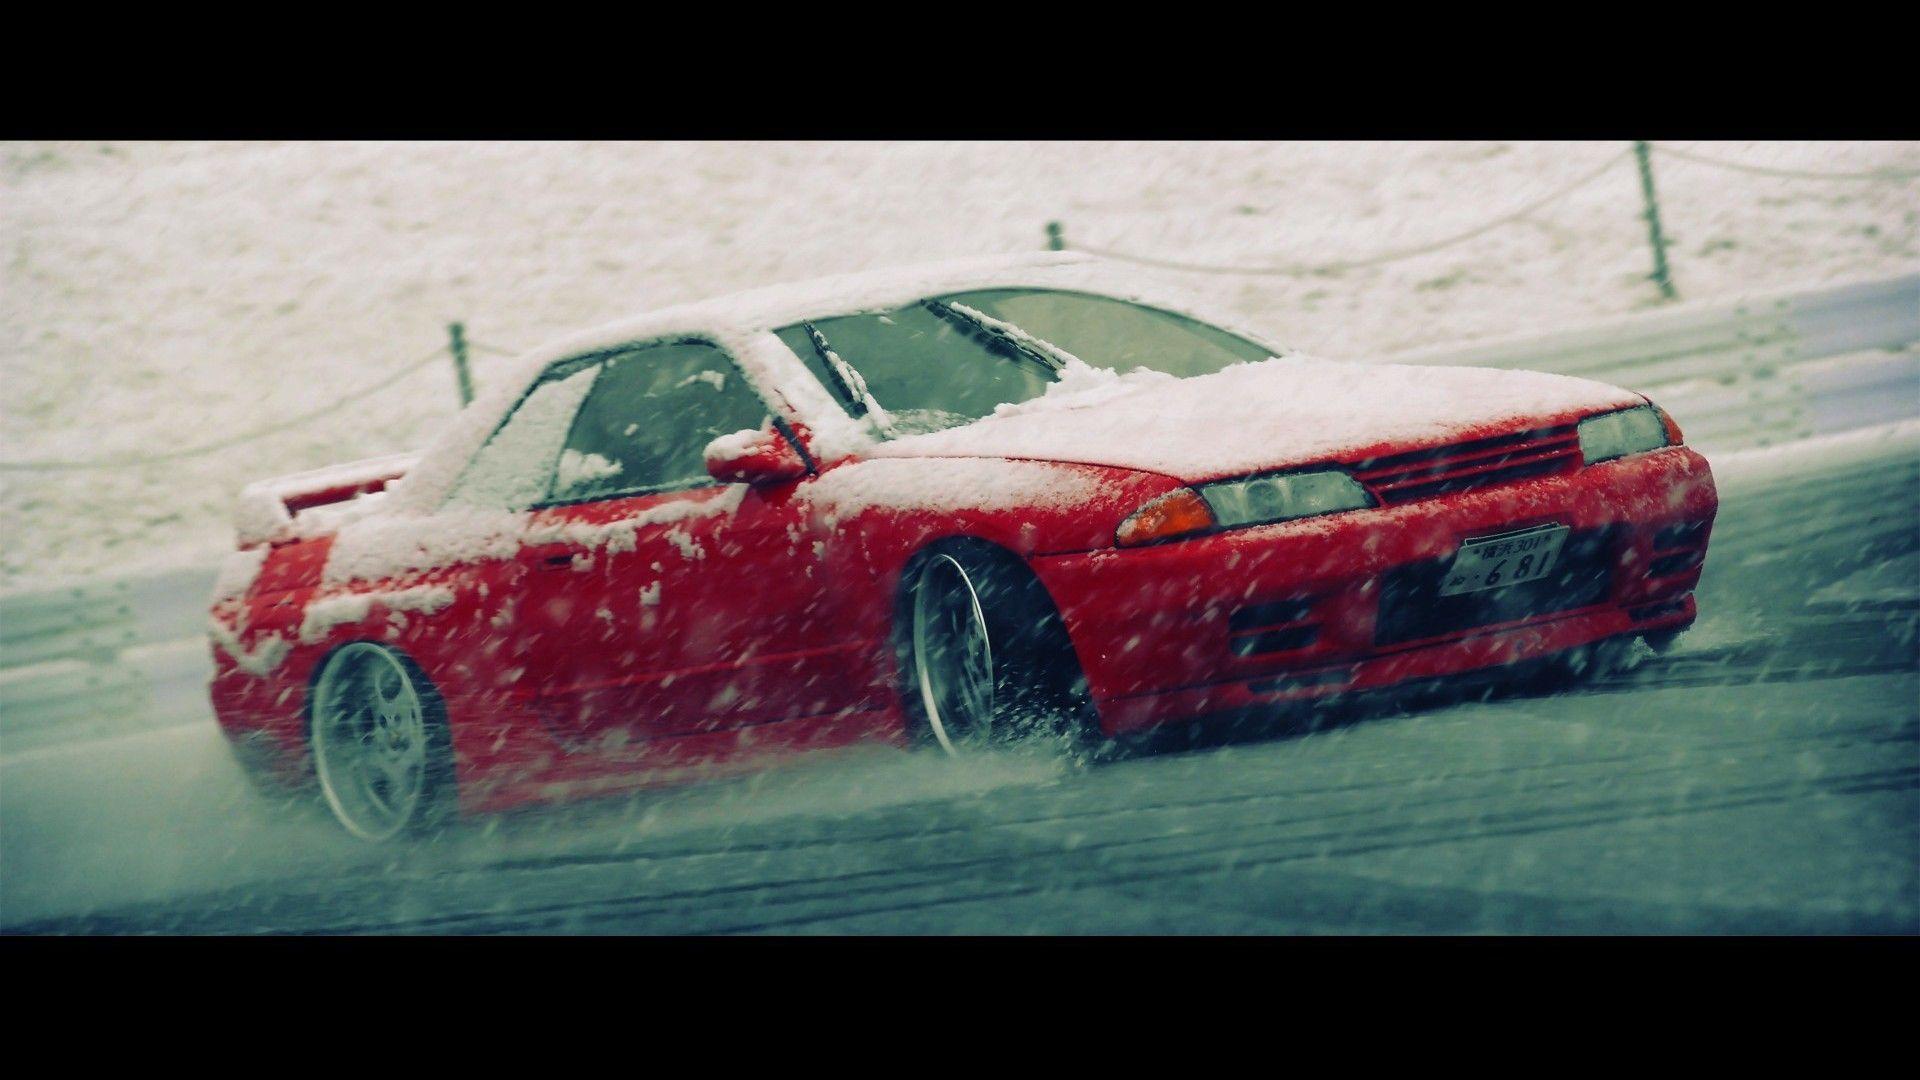 Monochrome Car Wreck Nissan Skyline R Wallpapers HD Desktop